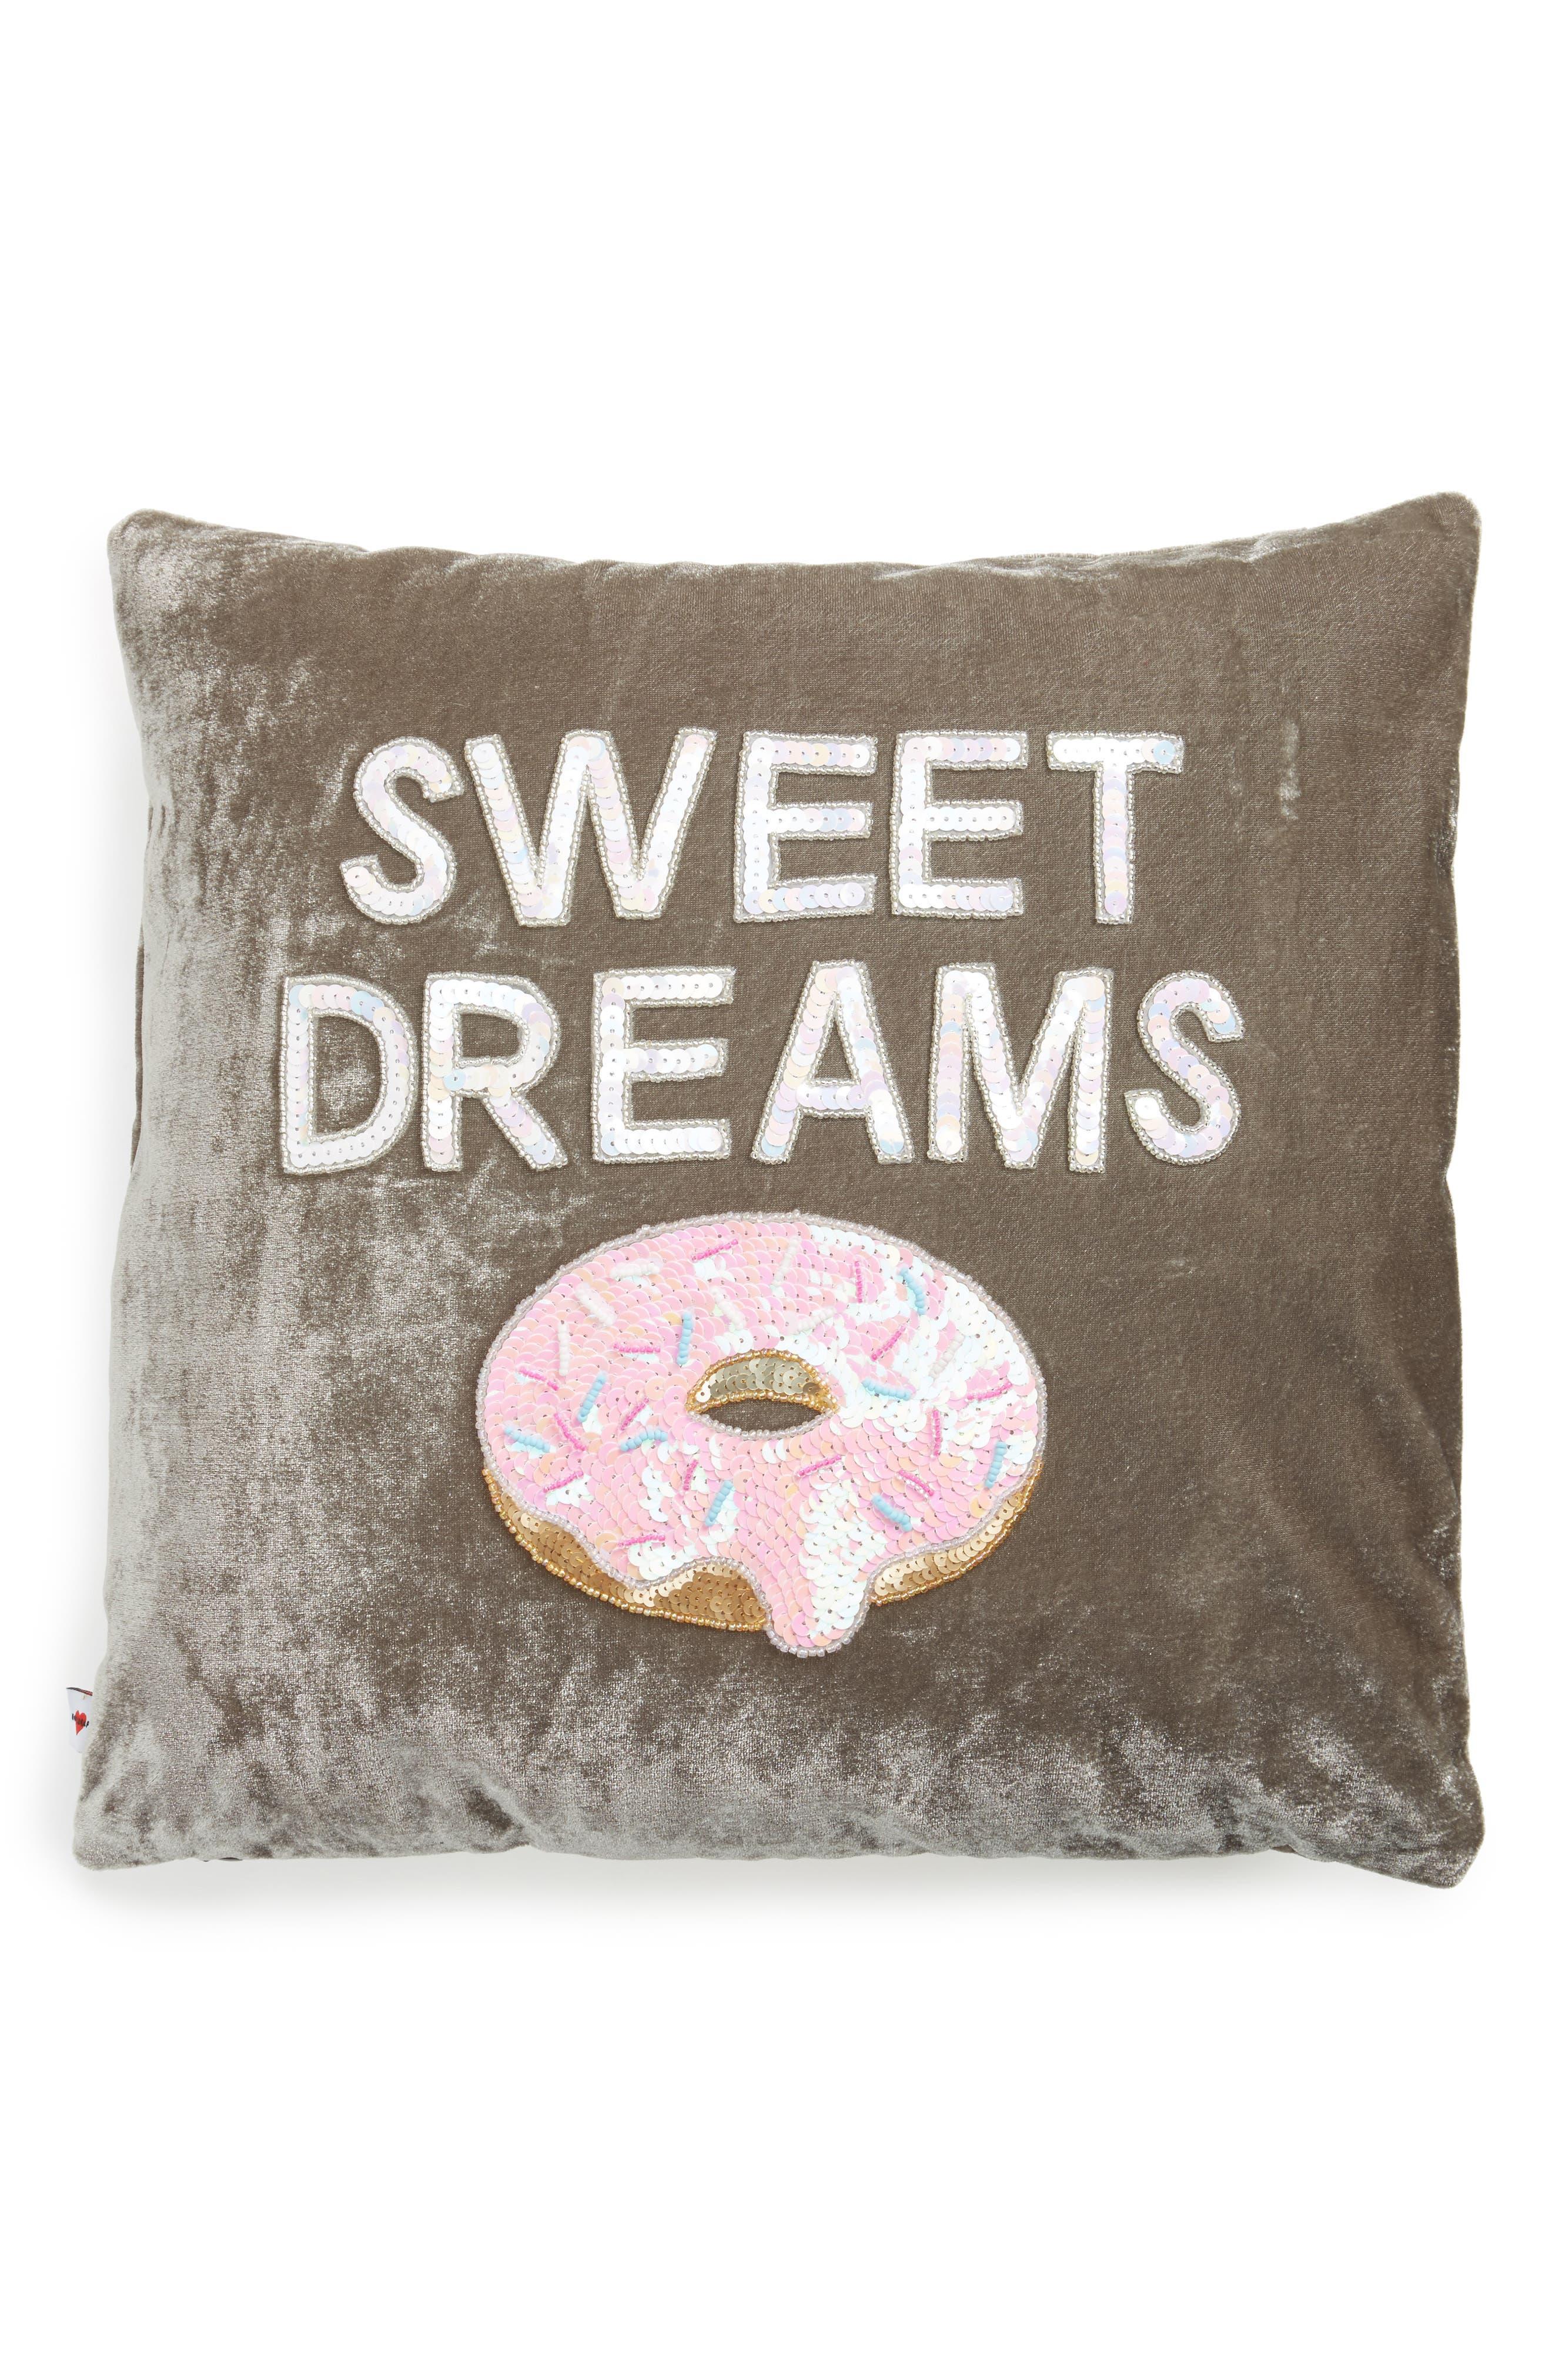 Sweet Dreams Velvet Pillow,                             Main thumbnail 1, color,                             020